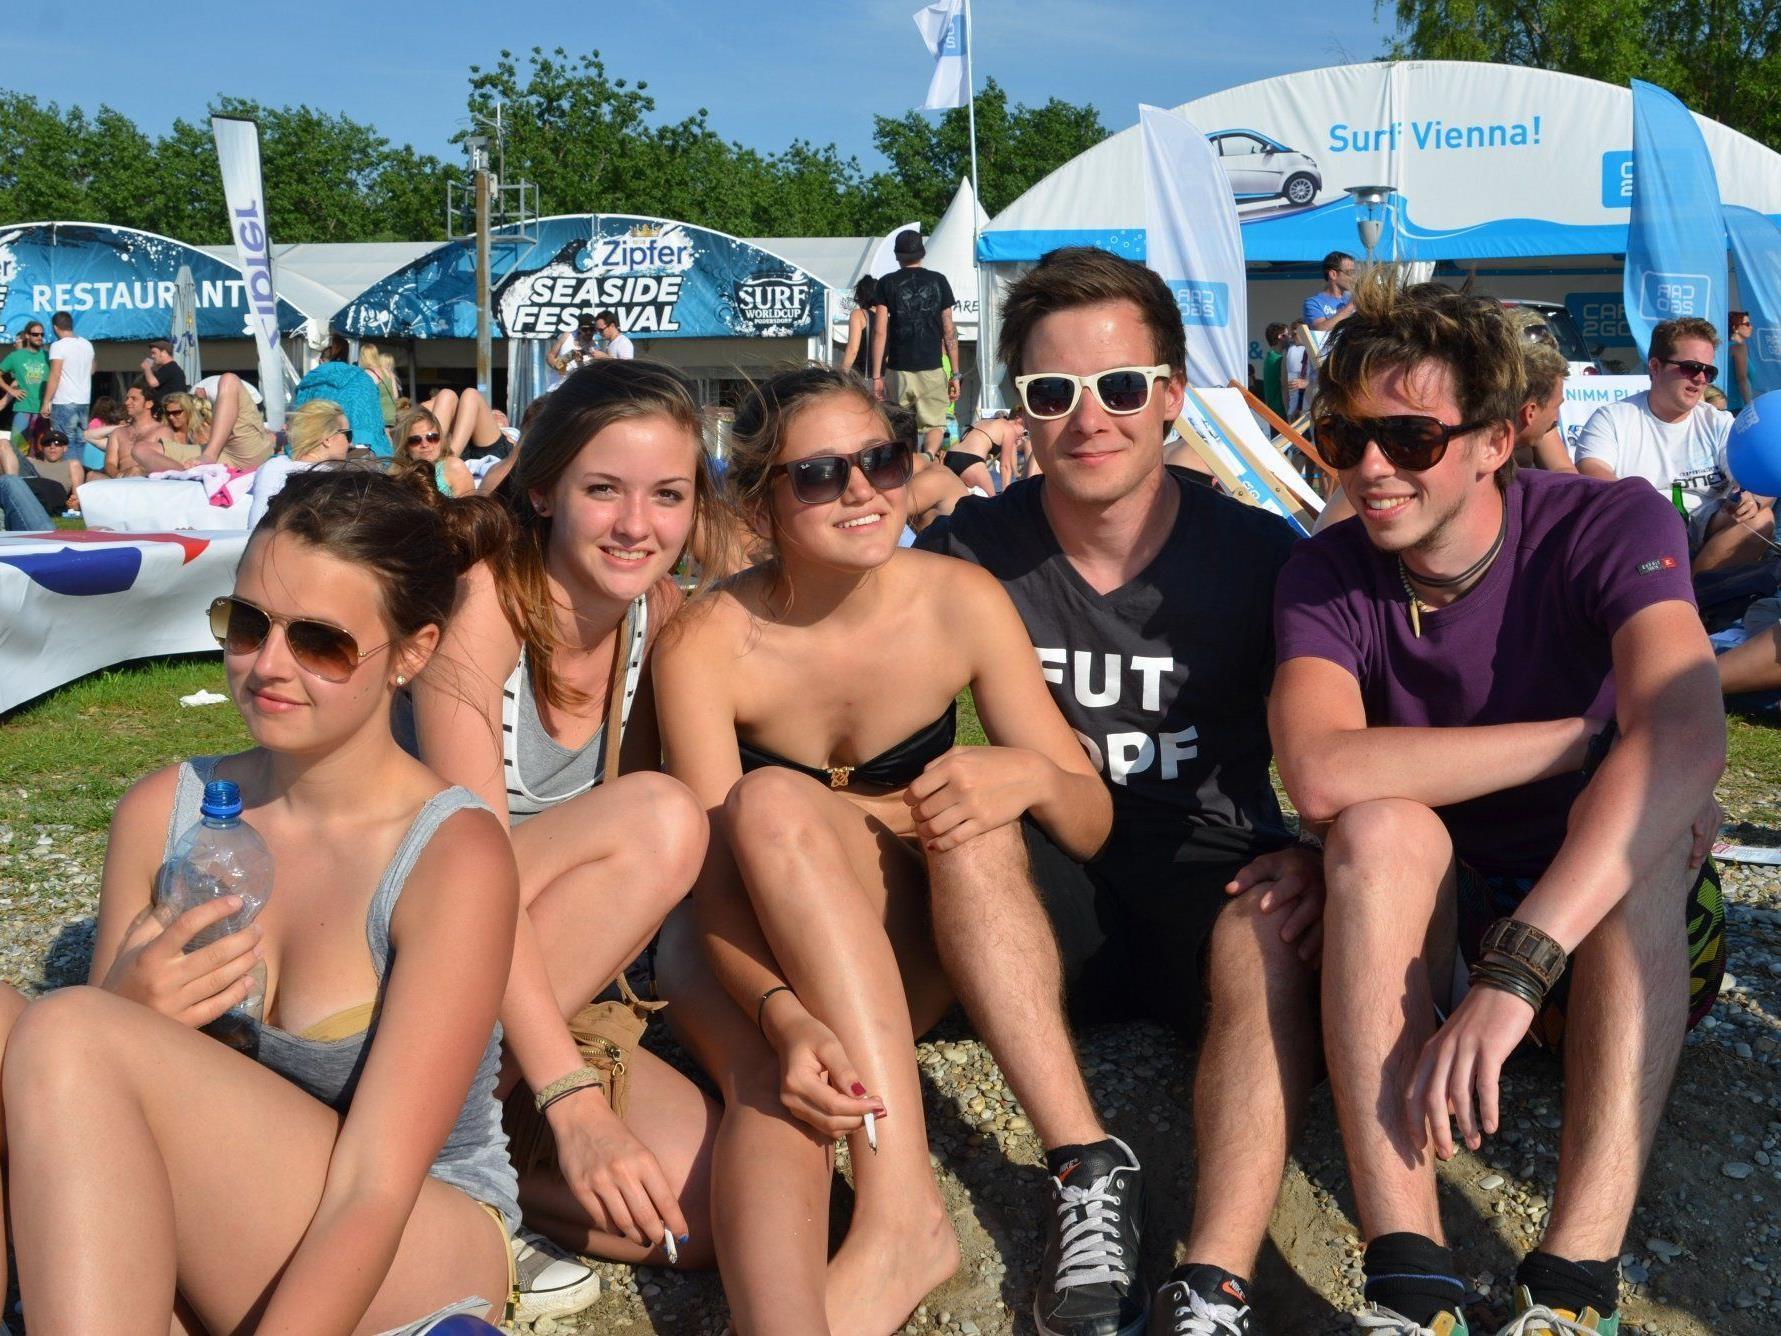 Super Stimmung gab es am Zipfer Seaside Festival.